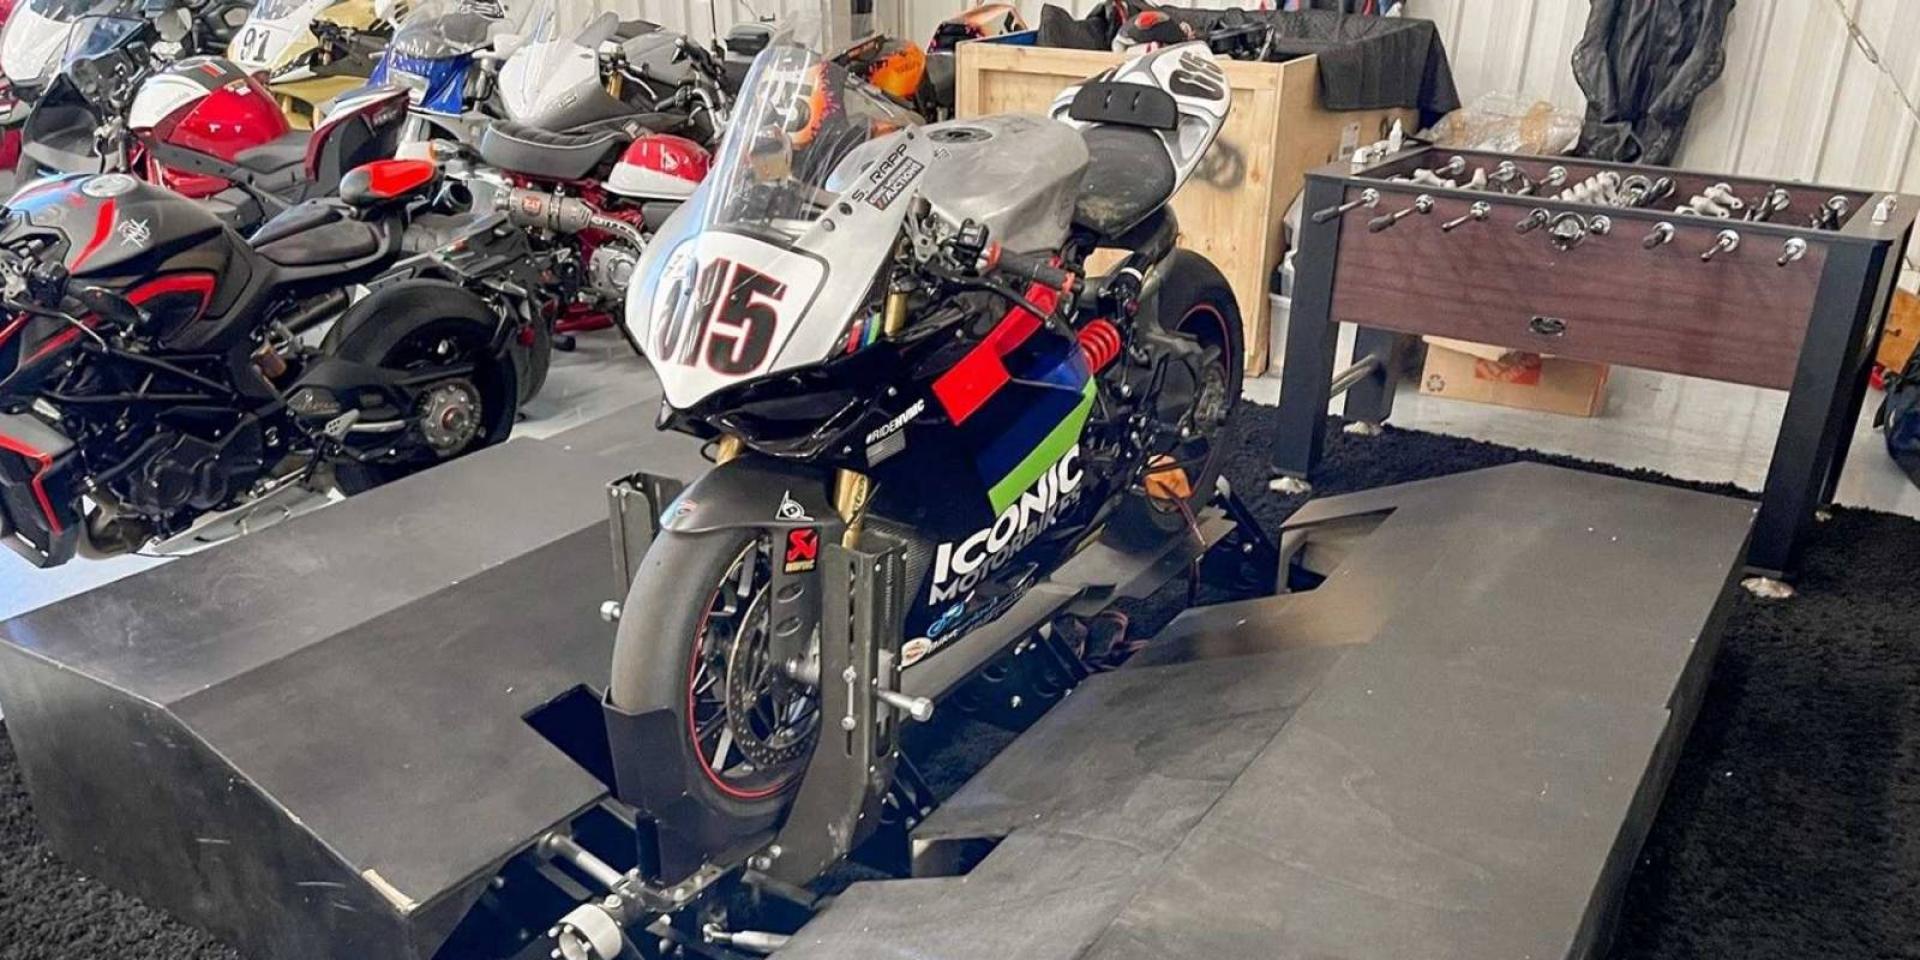 花16萬就能在家騎車!Moto Trainer Basic 模擬器拍賣中